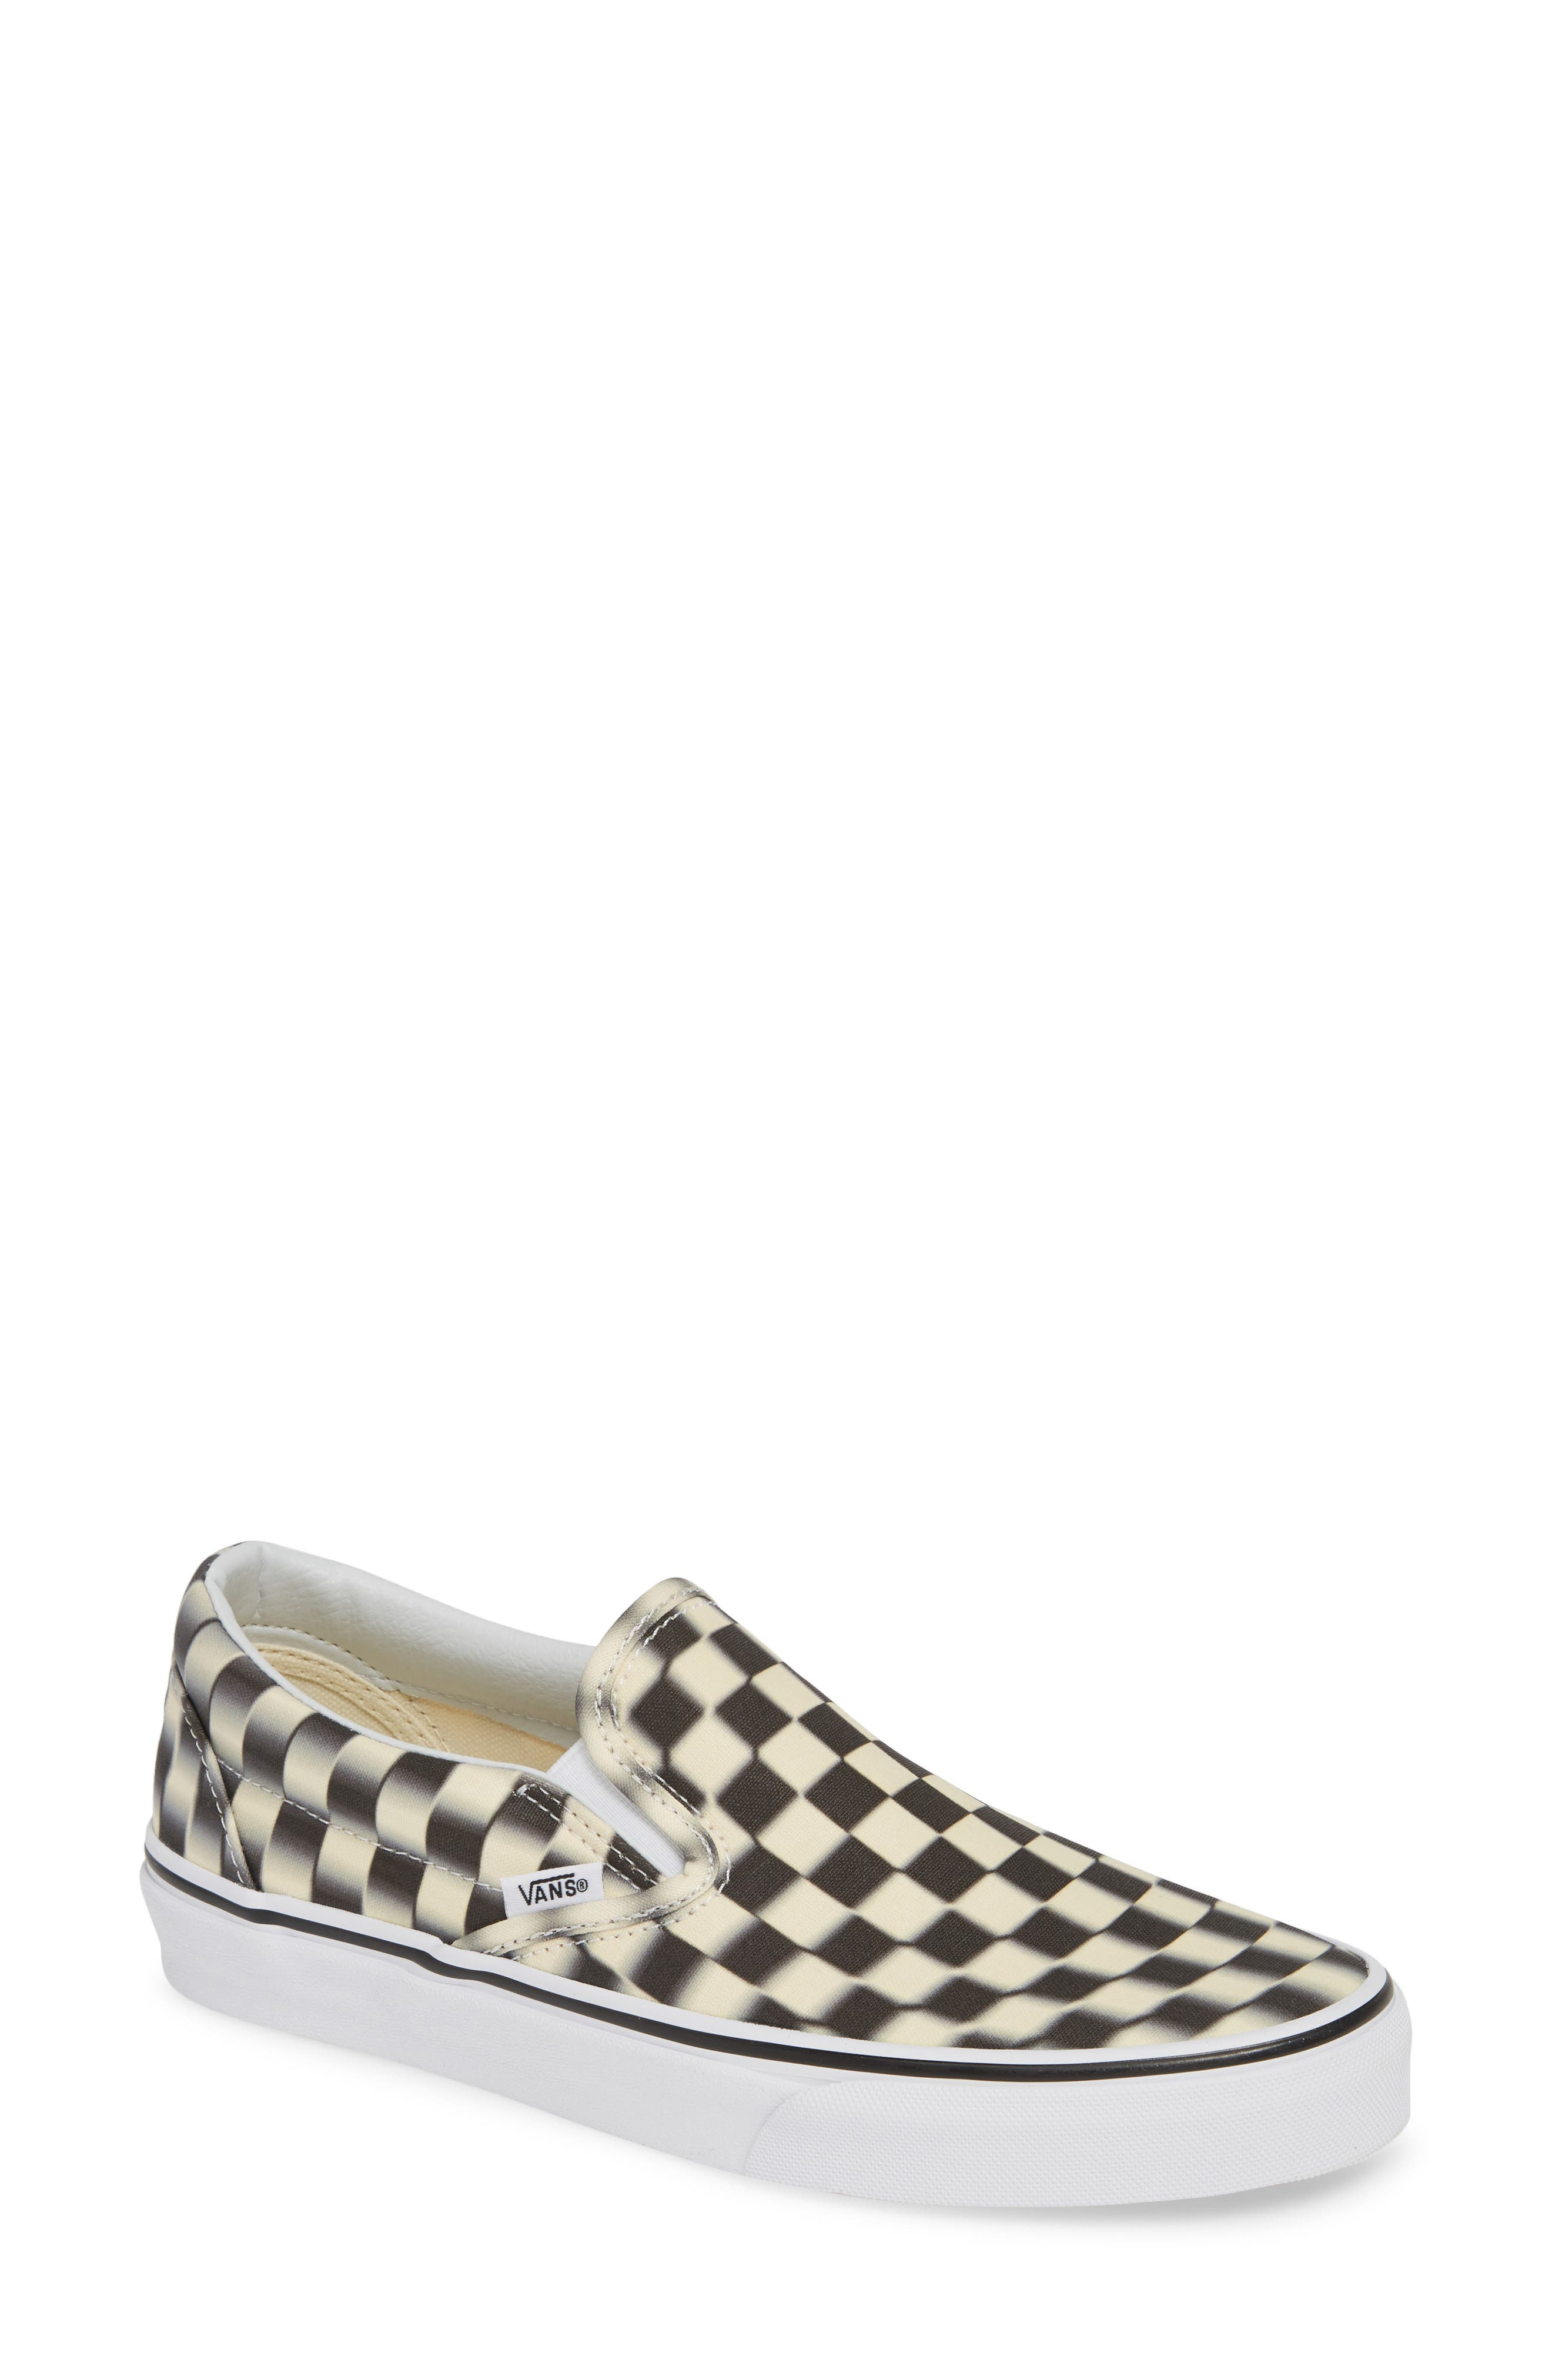 VANS, Classic Slip-On Sneaker, Main thumbnail 1, color, 011